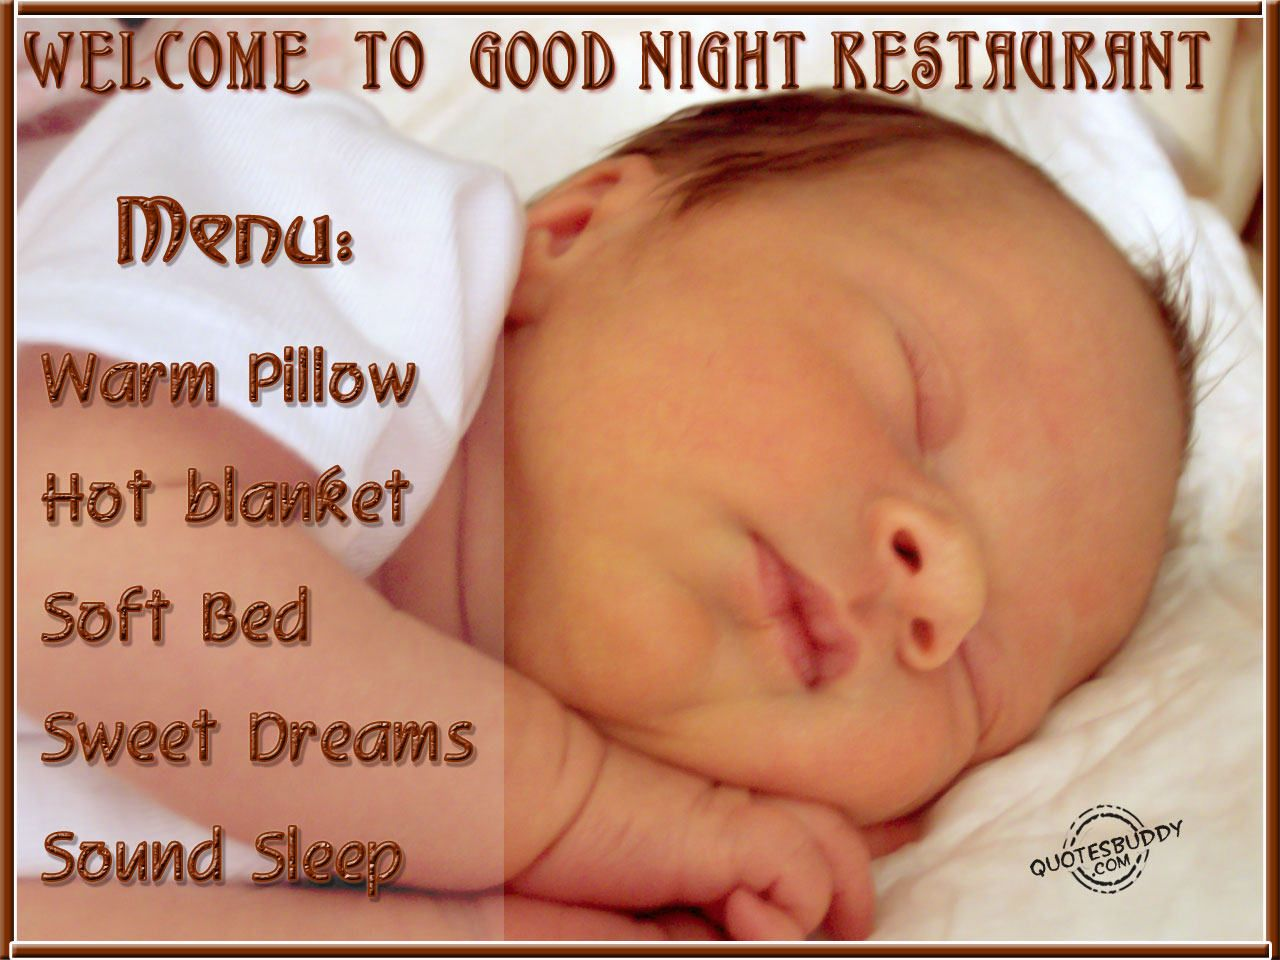 Good Night Quotes Graphics Good Night Funny Funny Good Night Quotes Good Night Quotes